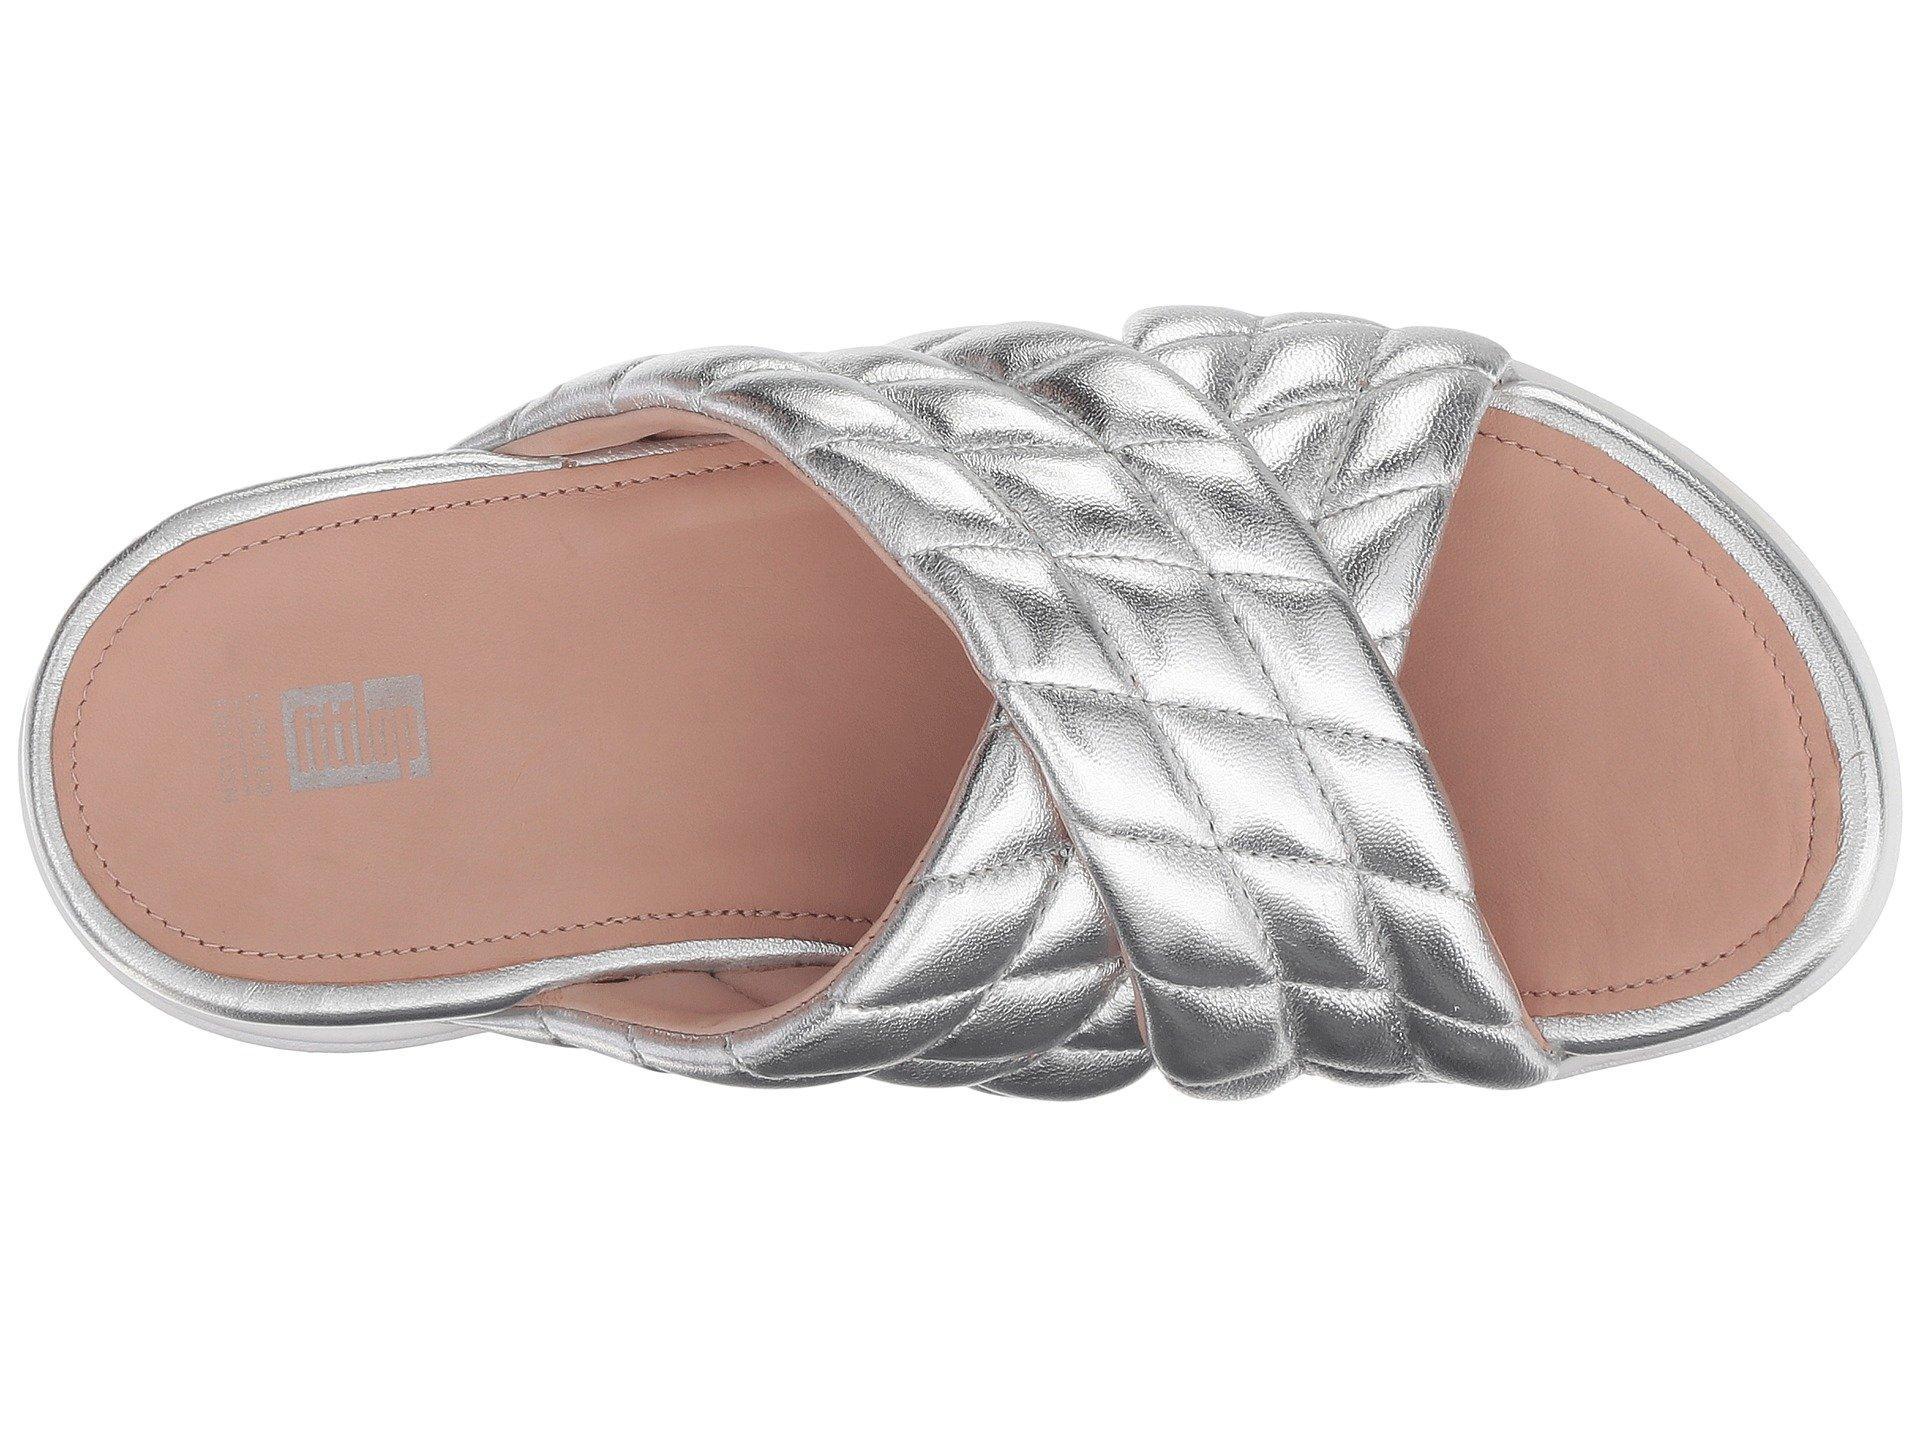 0e90f9fa841d0 Fitflop - Metallic Loosh Luxetm Cross Slide Leather Sandals - Lyst. View  fullscreen